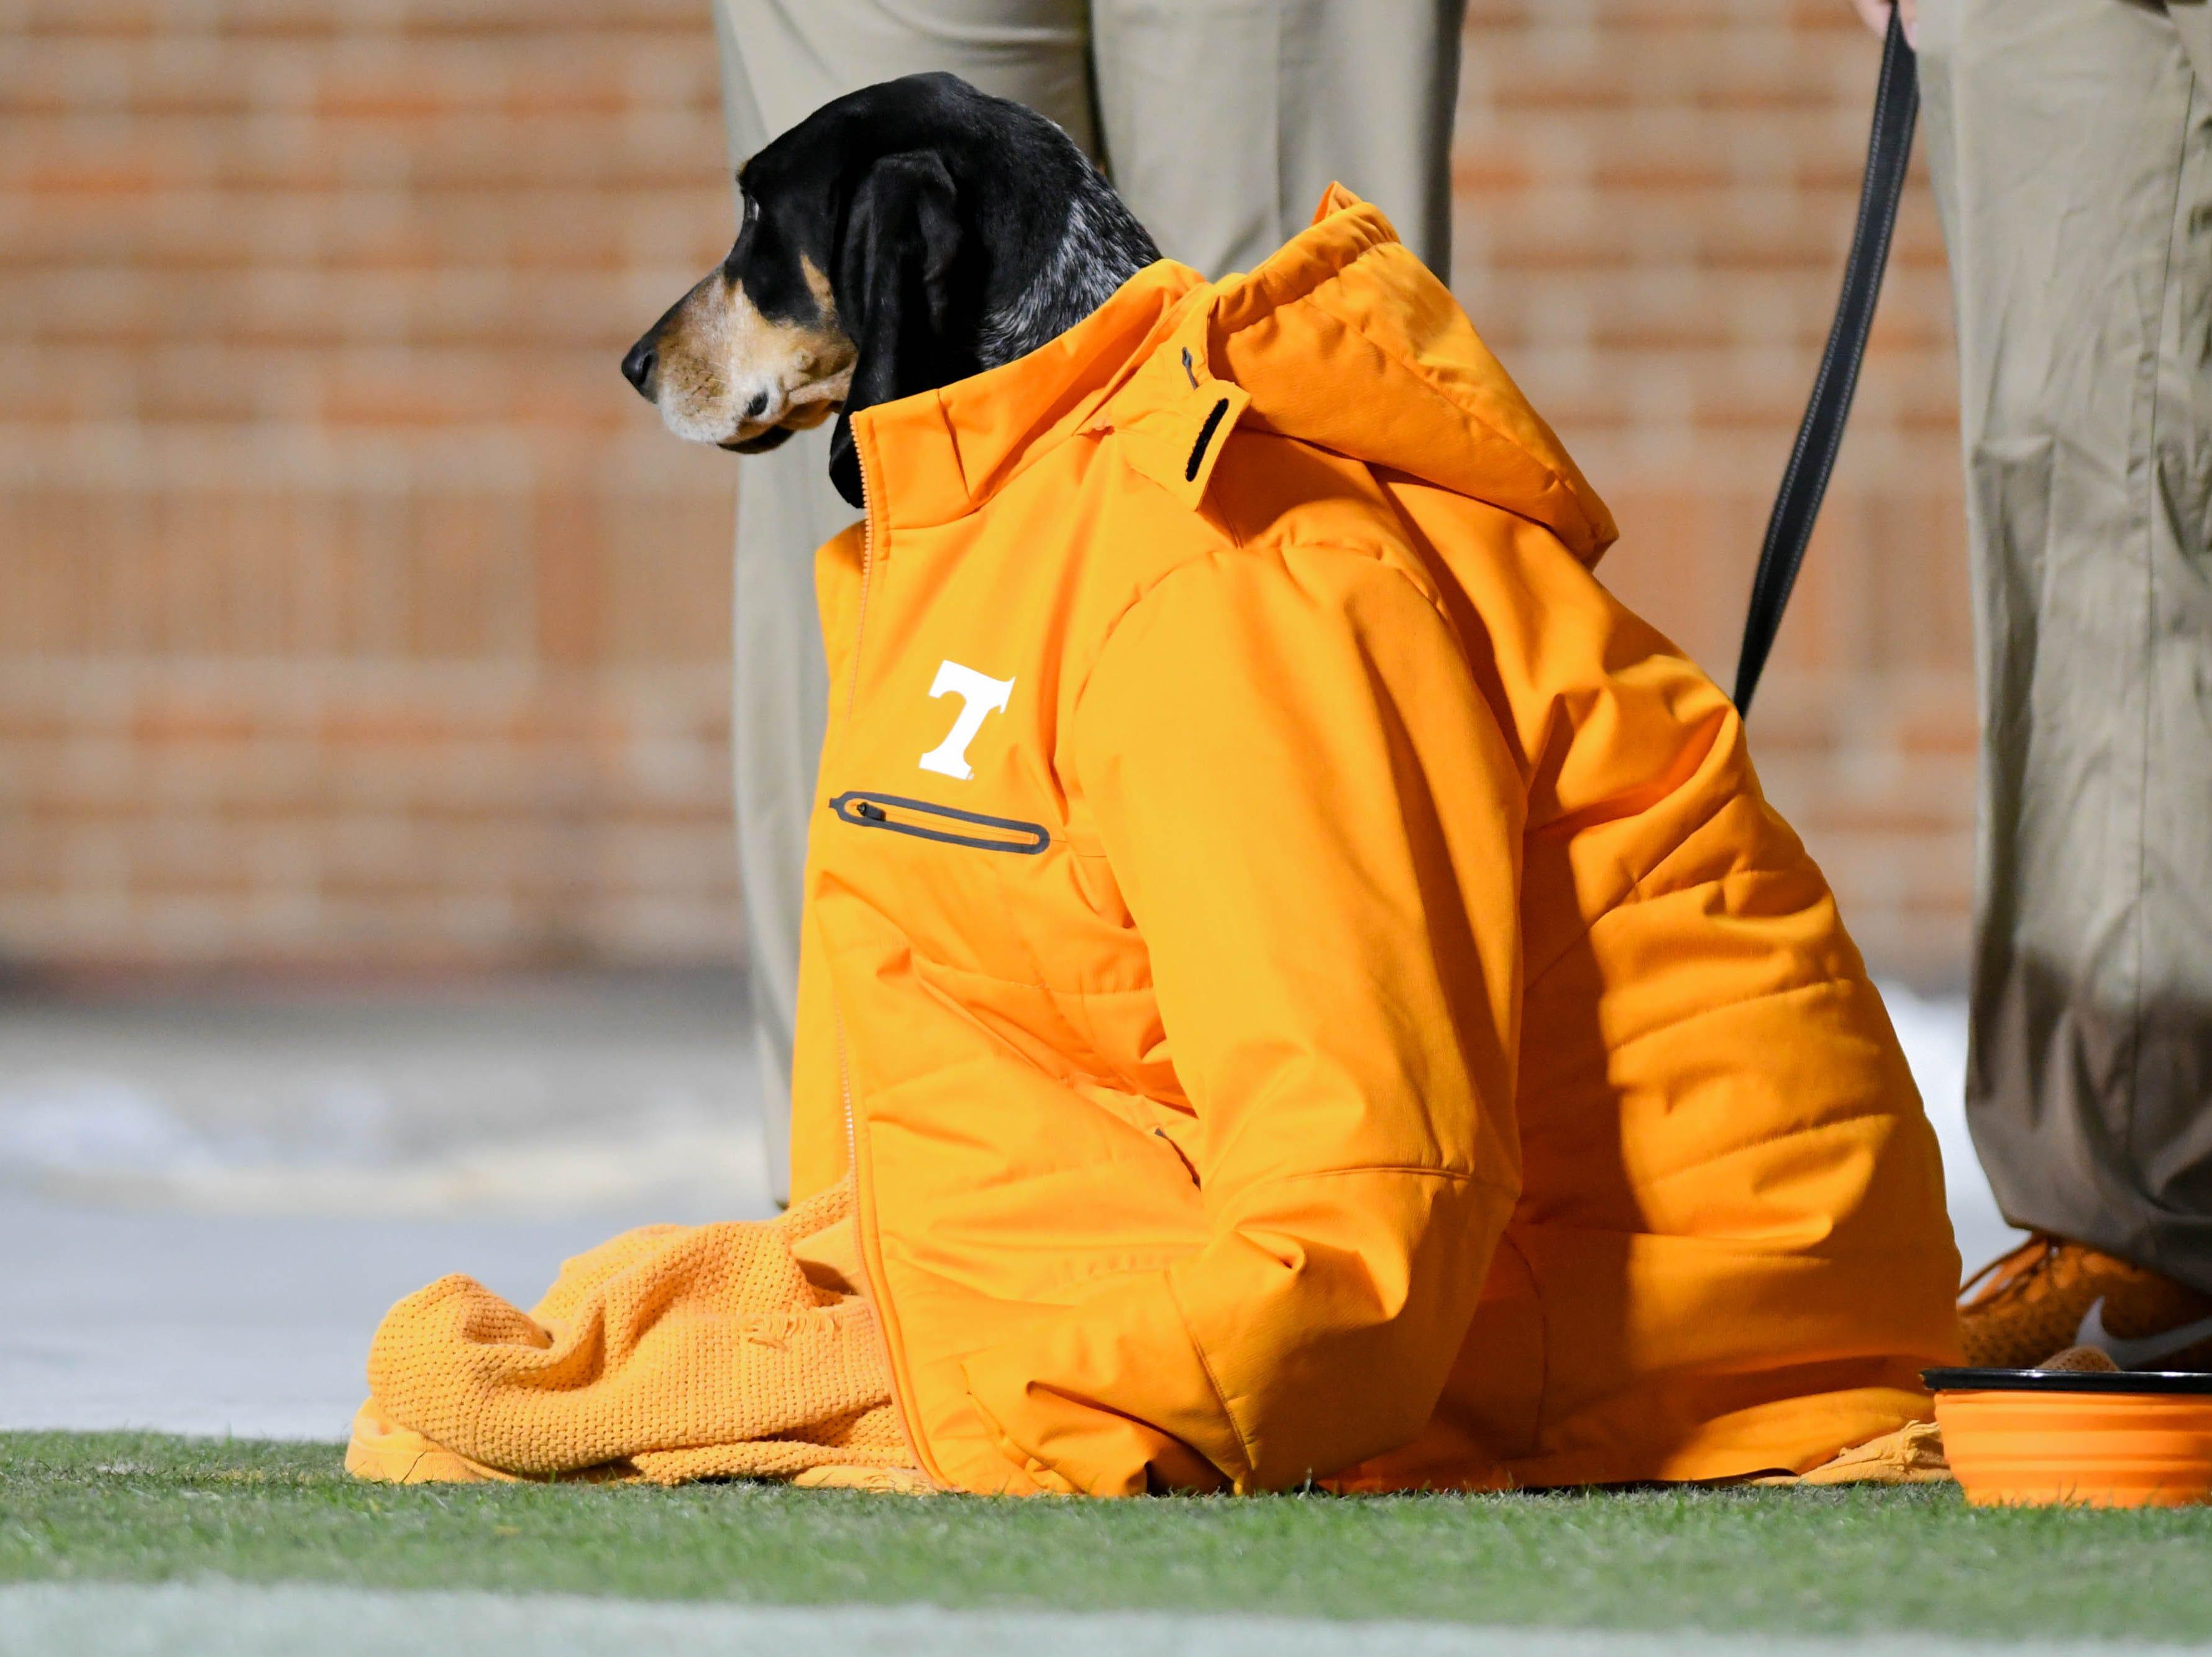 Week 11: Tennessee Volunteers mascot Smokey during the second half against the Kentucky Wildcats at Neyland Stadium.